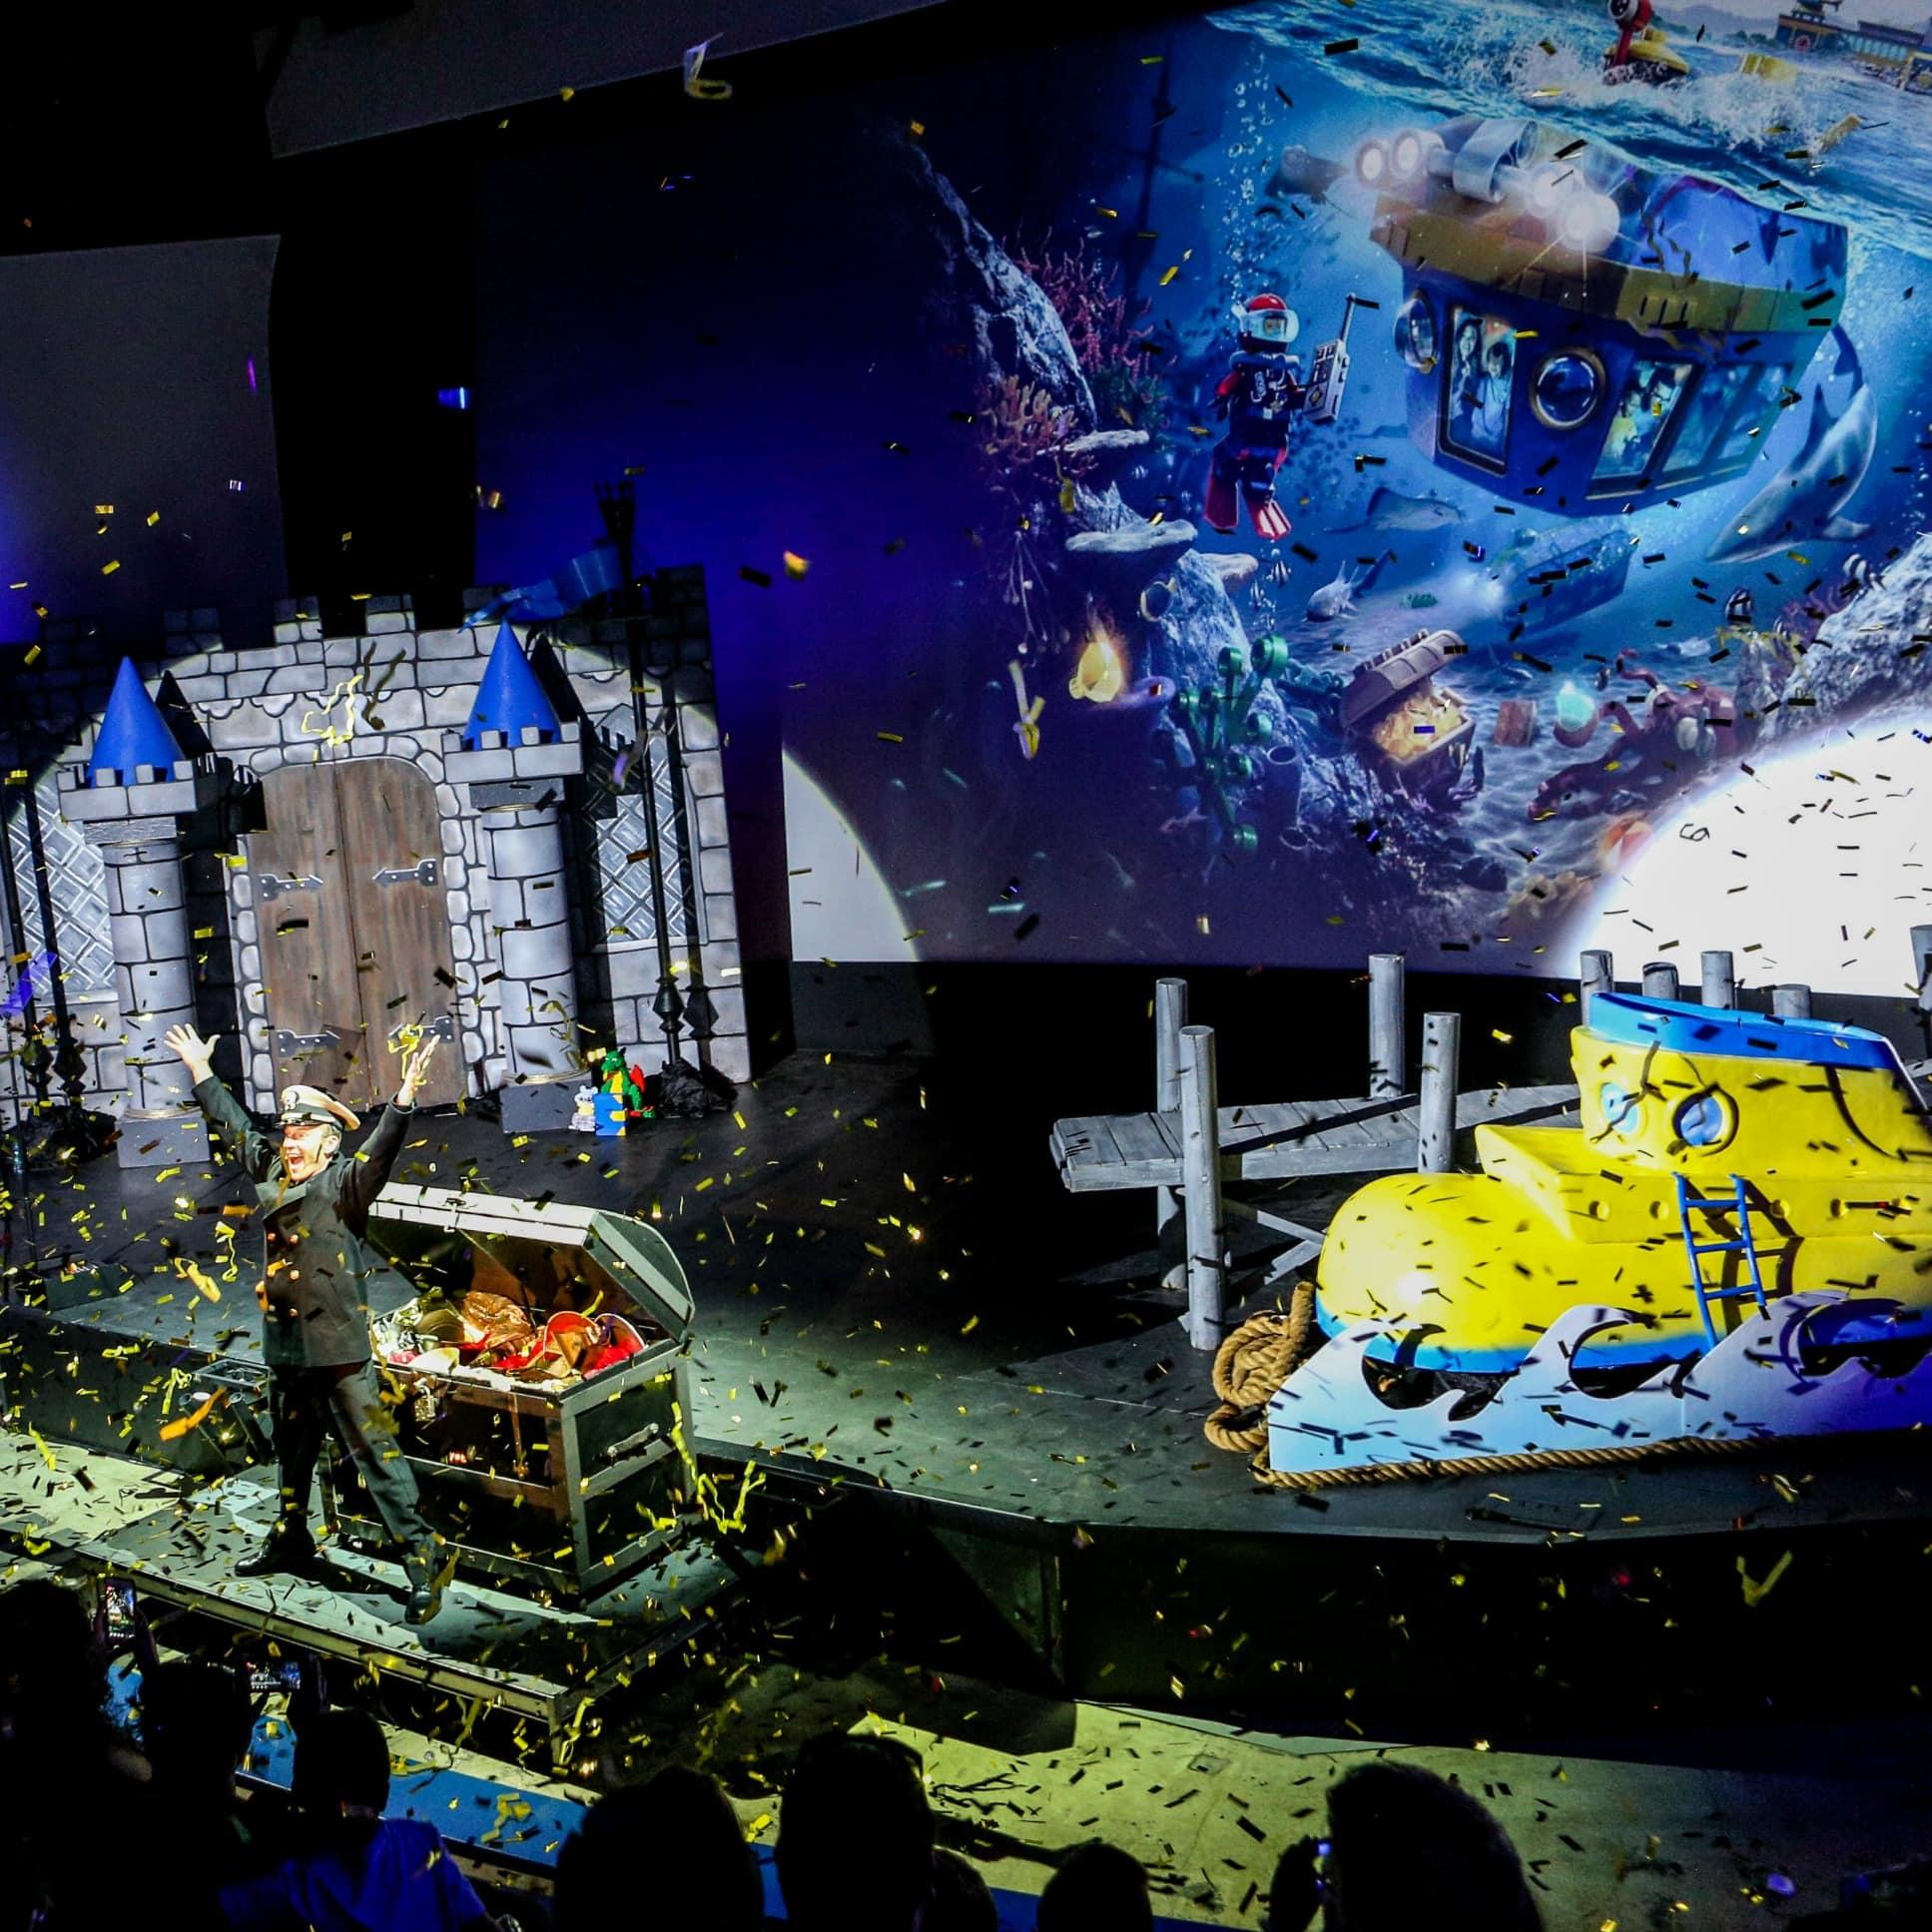 LEGO City Deep Sea Adventure Submarine Ride Coming Soon to LEGOLAND CA - Make Life Lovely